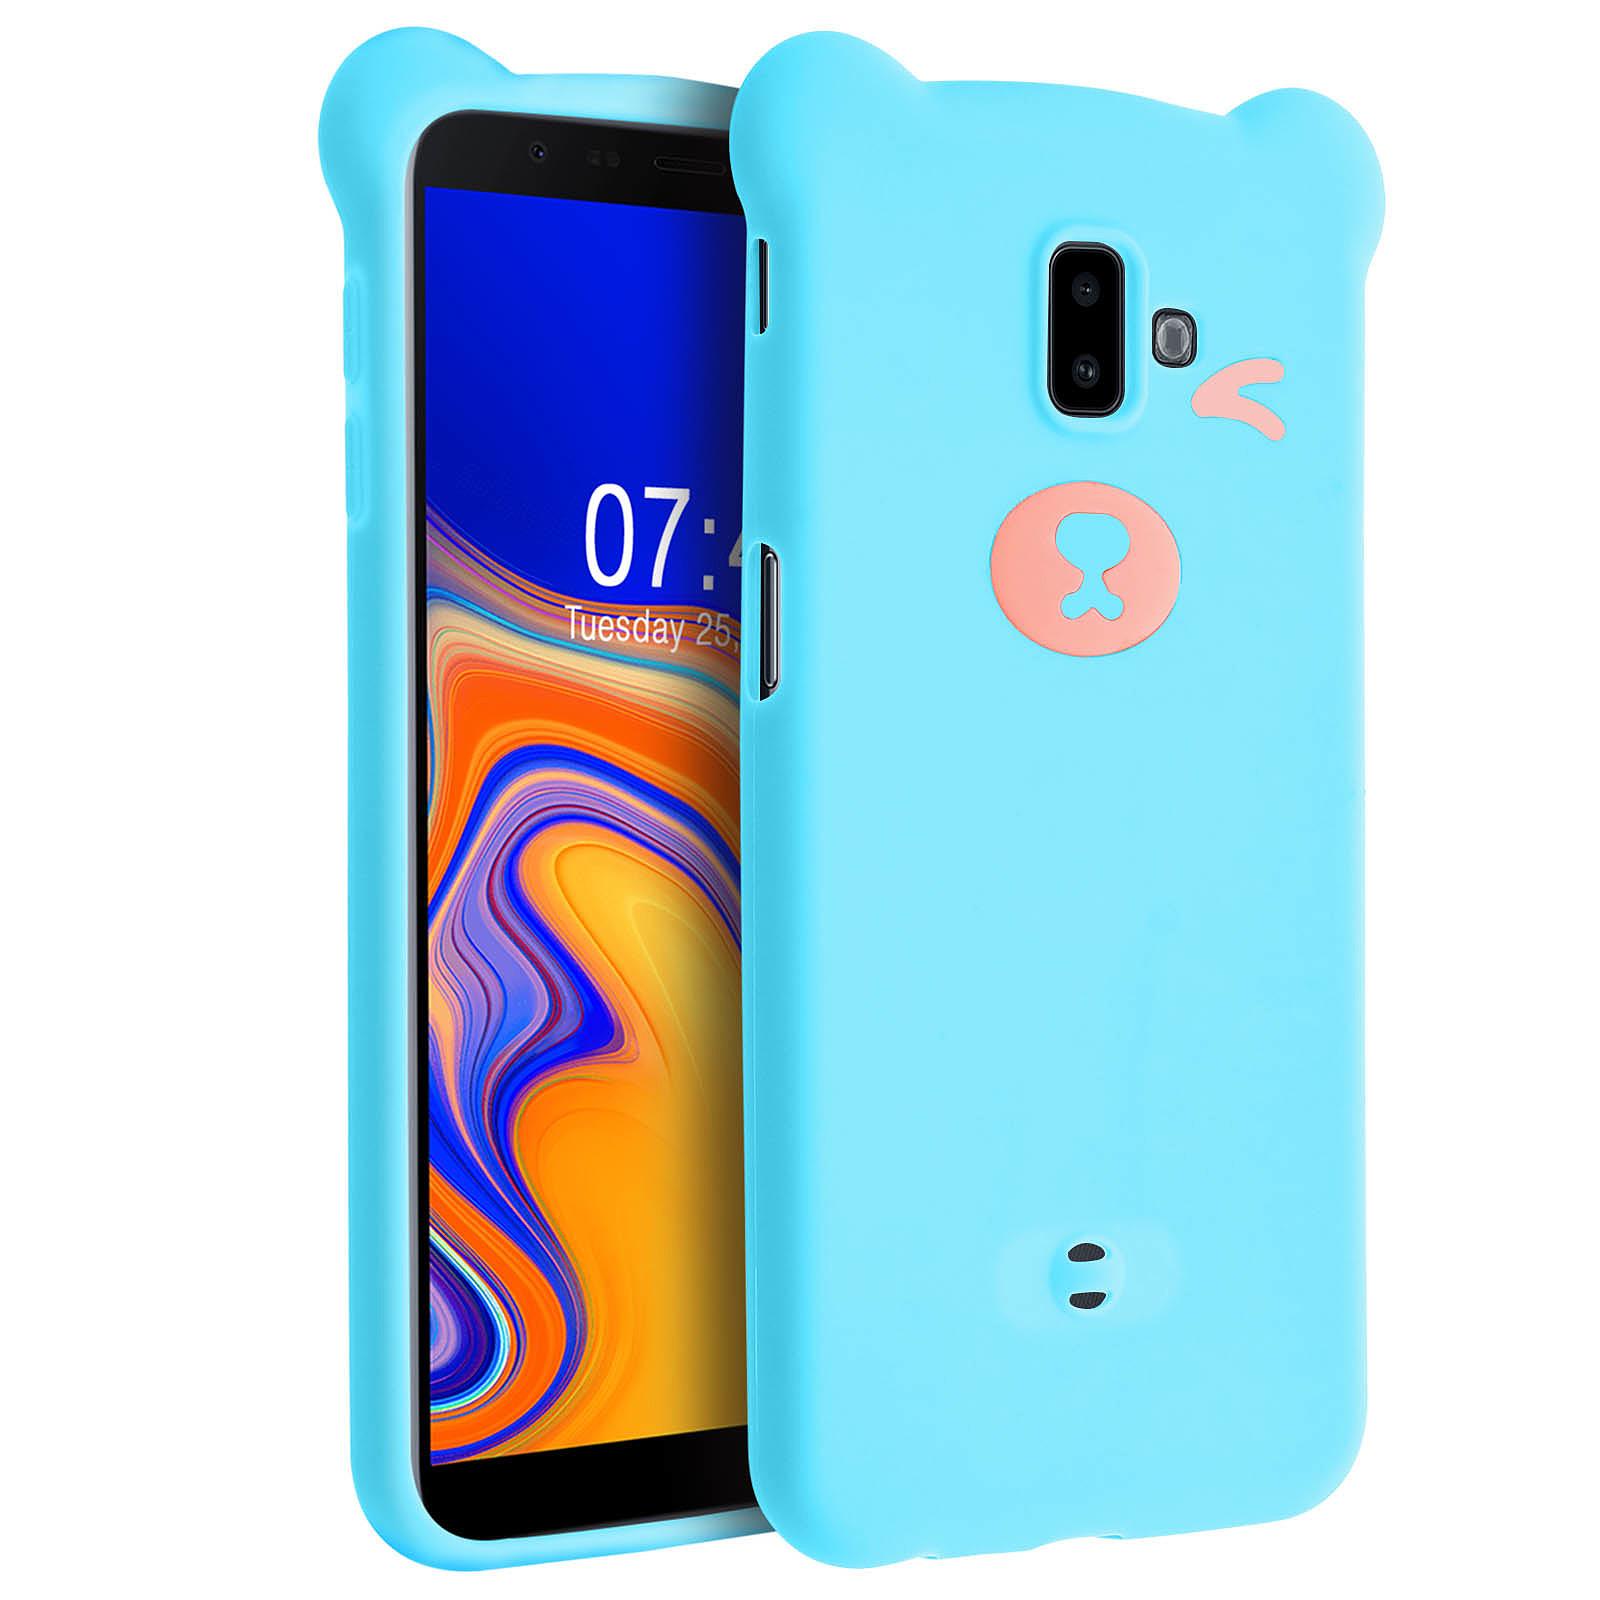 Avizar Coque Bleu Design Nounours pour Samsung Galaxy J6 Plus